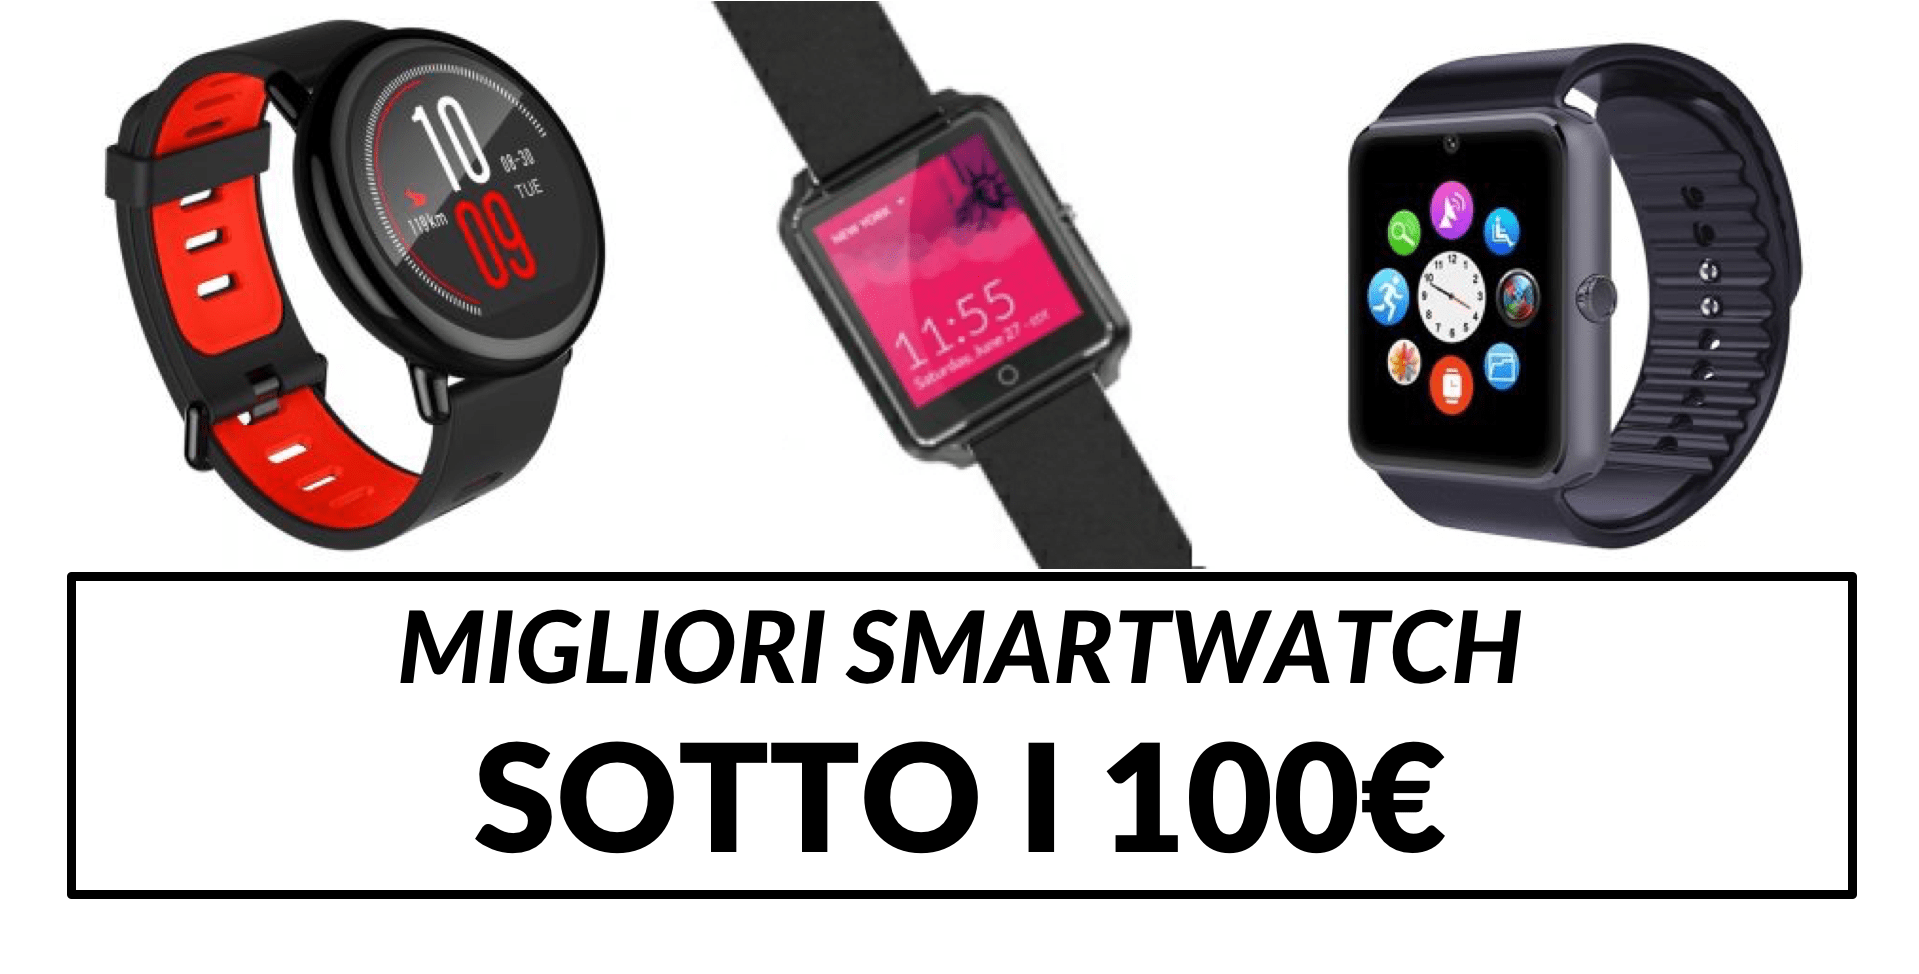 miglior orologio running 100 euro